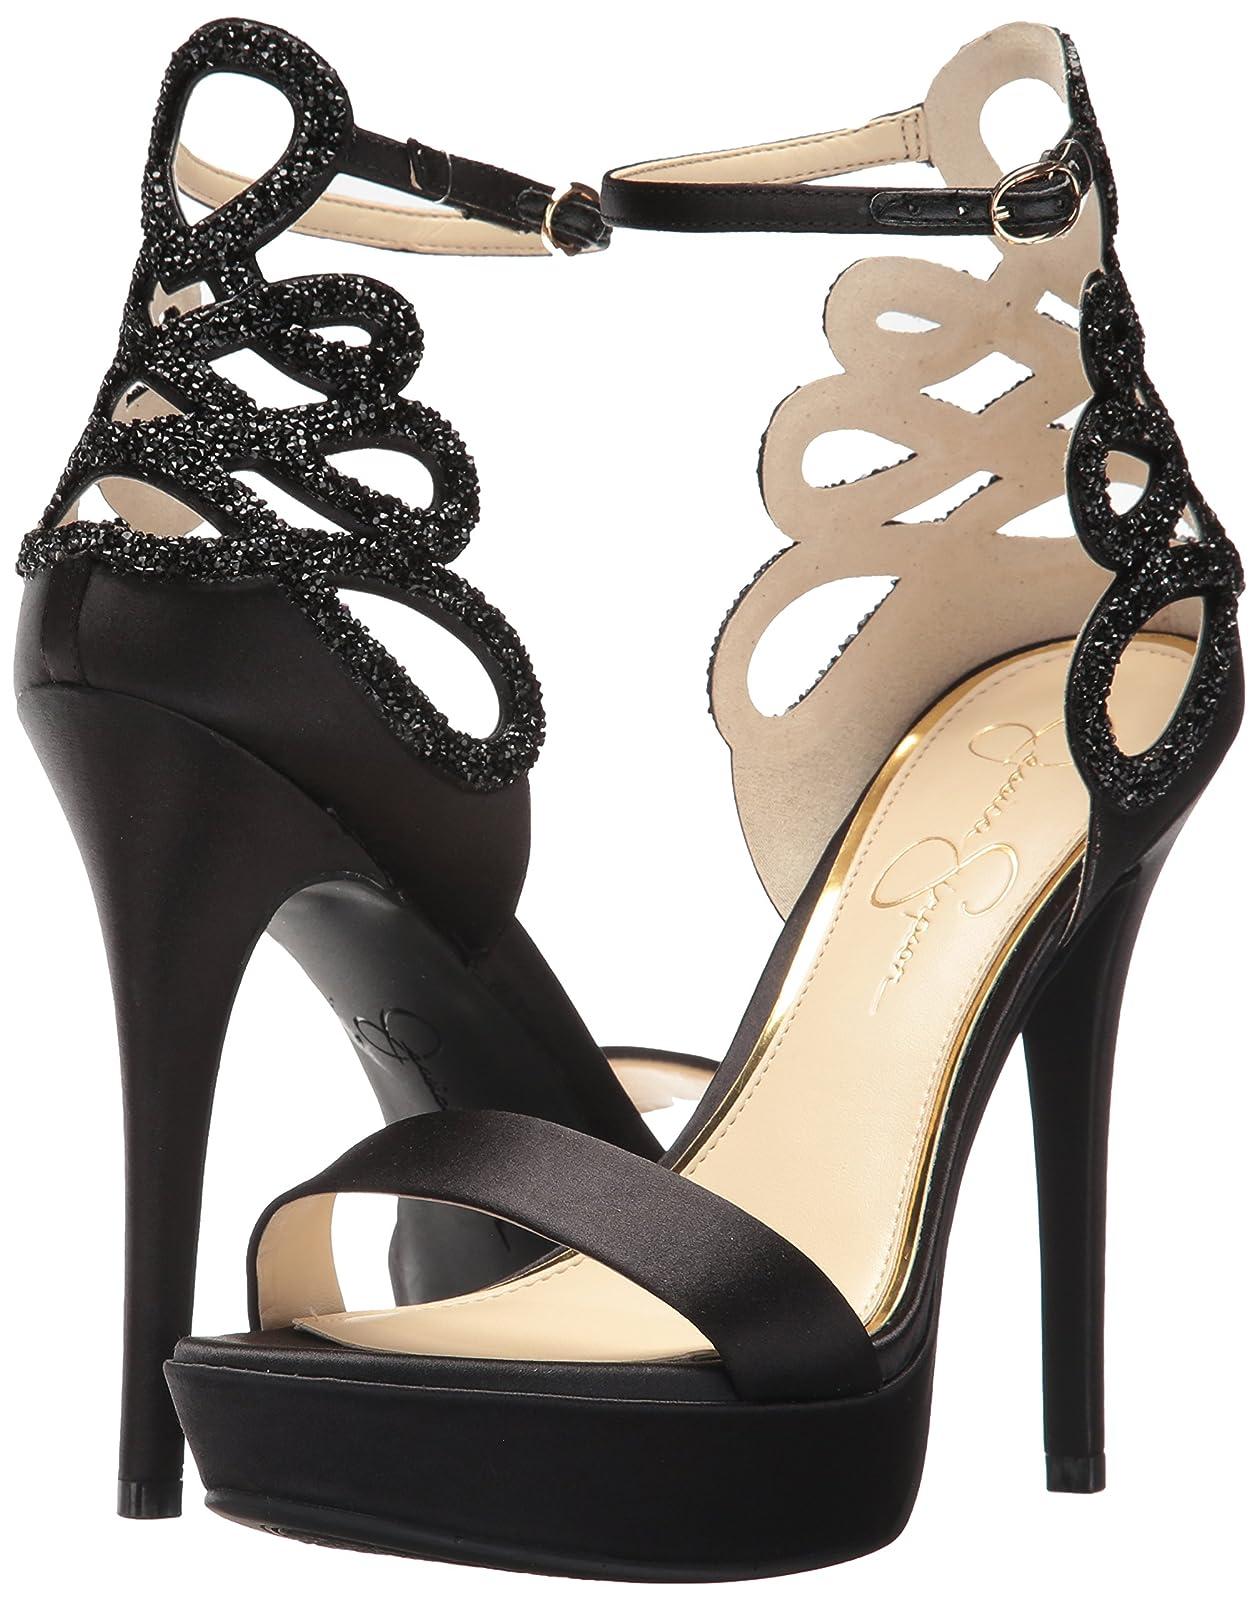 Jessica Simpson Women's BAYVINN Heeled Sandal US - 6